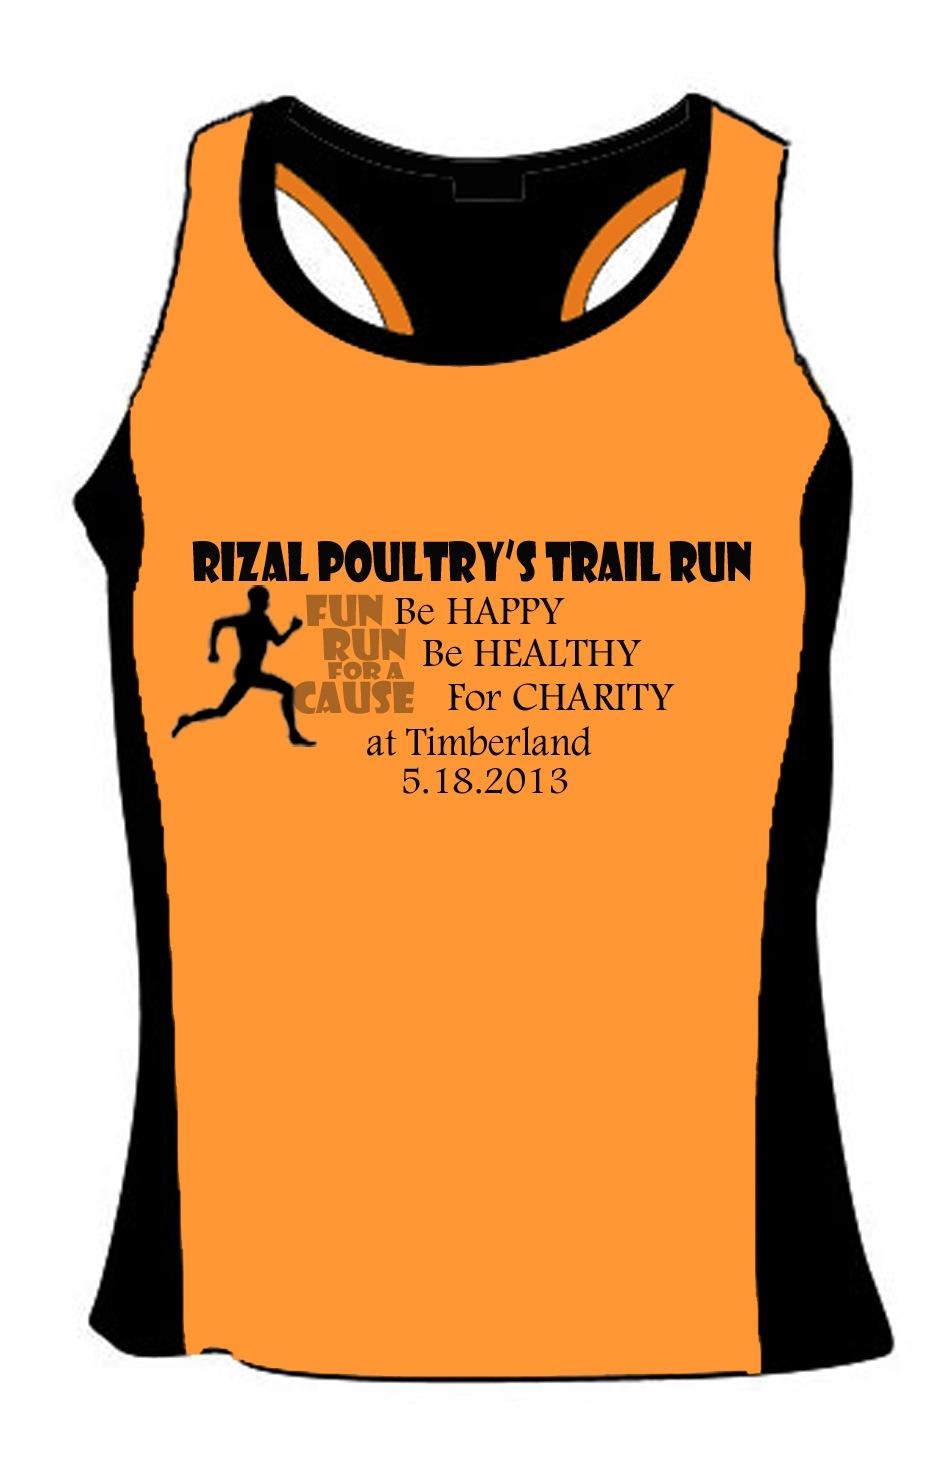 rizal-pountry-2013-run-singlet-updated